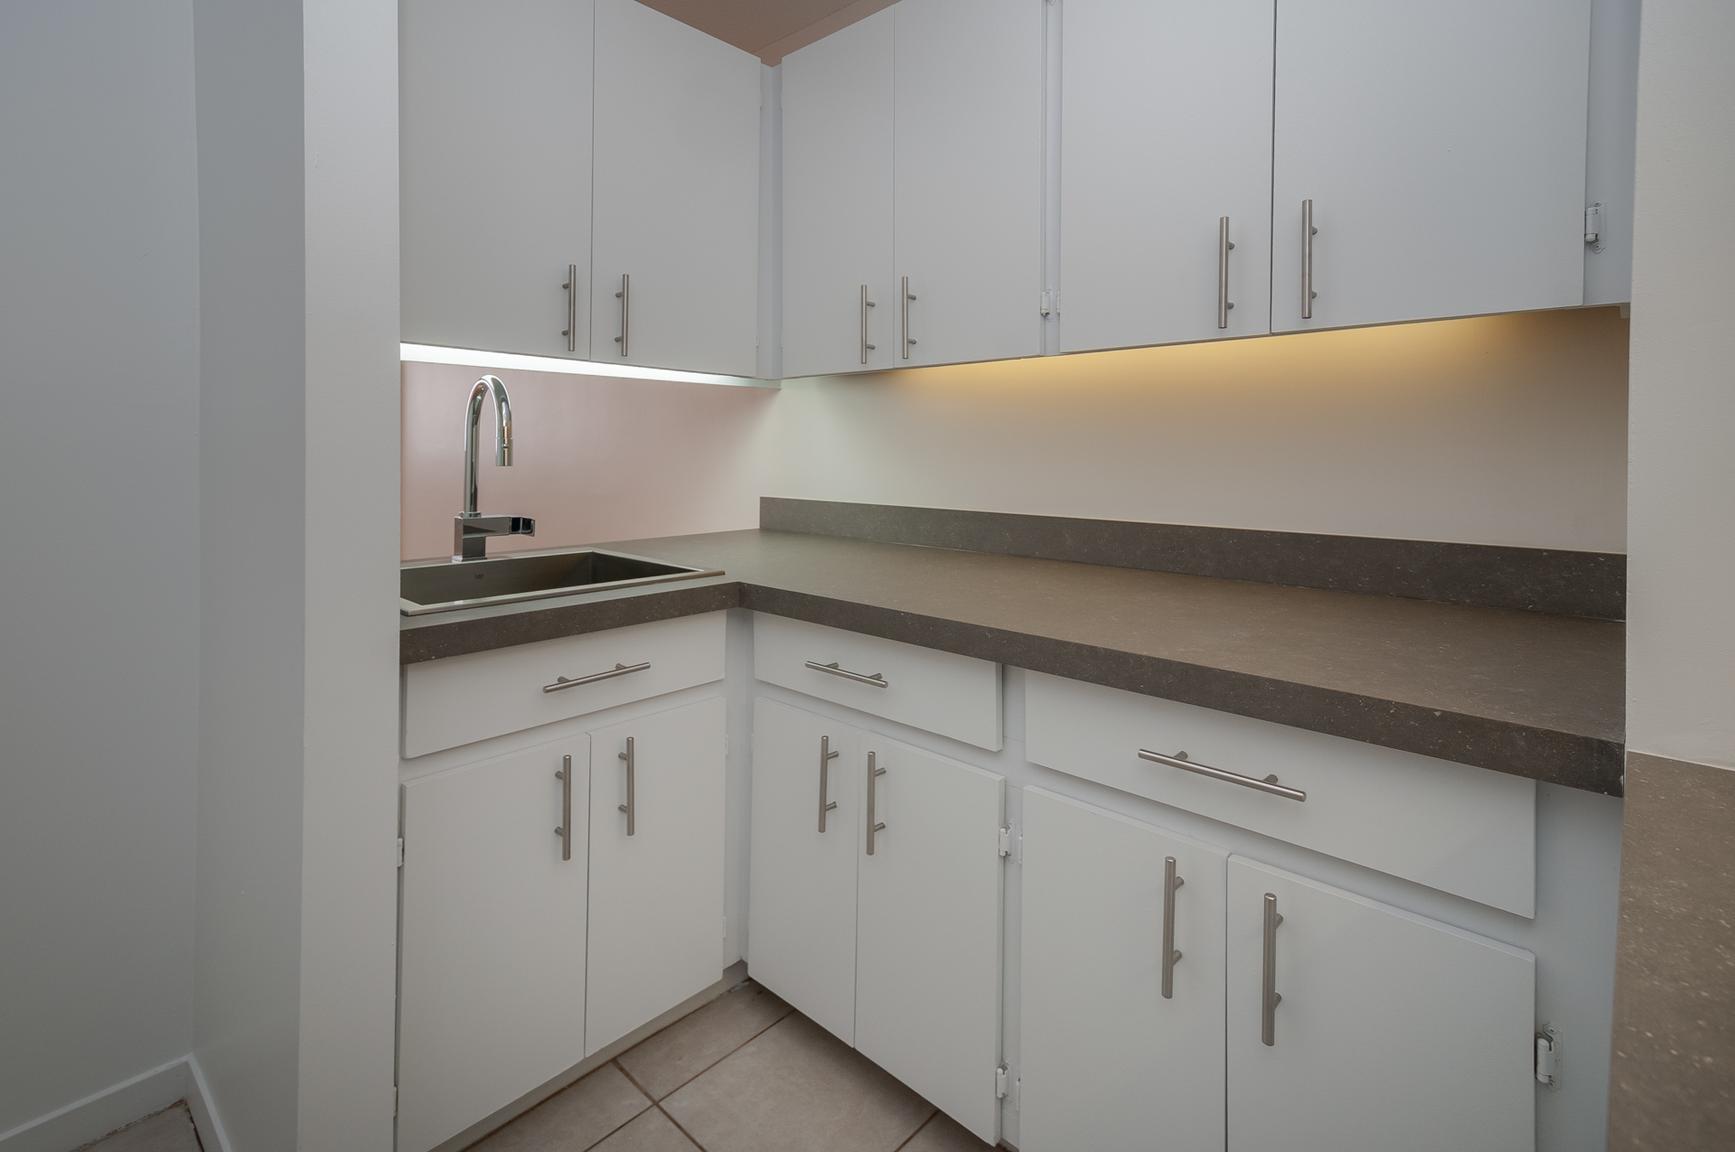 1 bedroom Apartments for rent in Quebec City at Les Jardins de Merici - Photo 19 - RentersPages – L407121